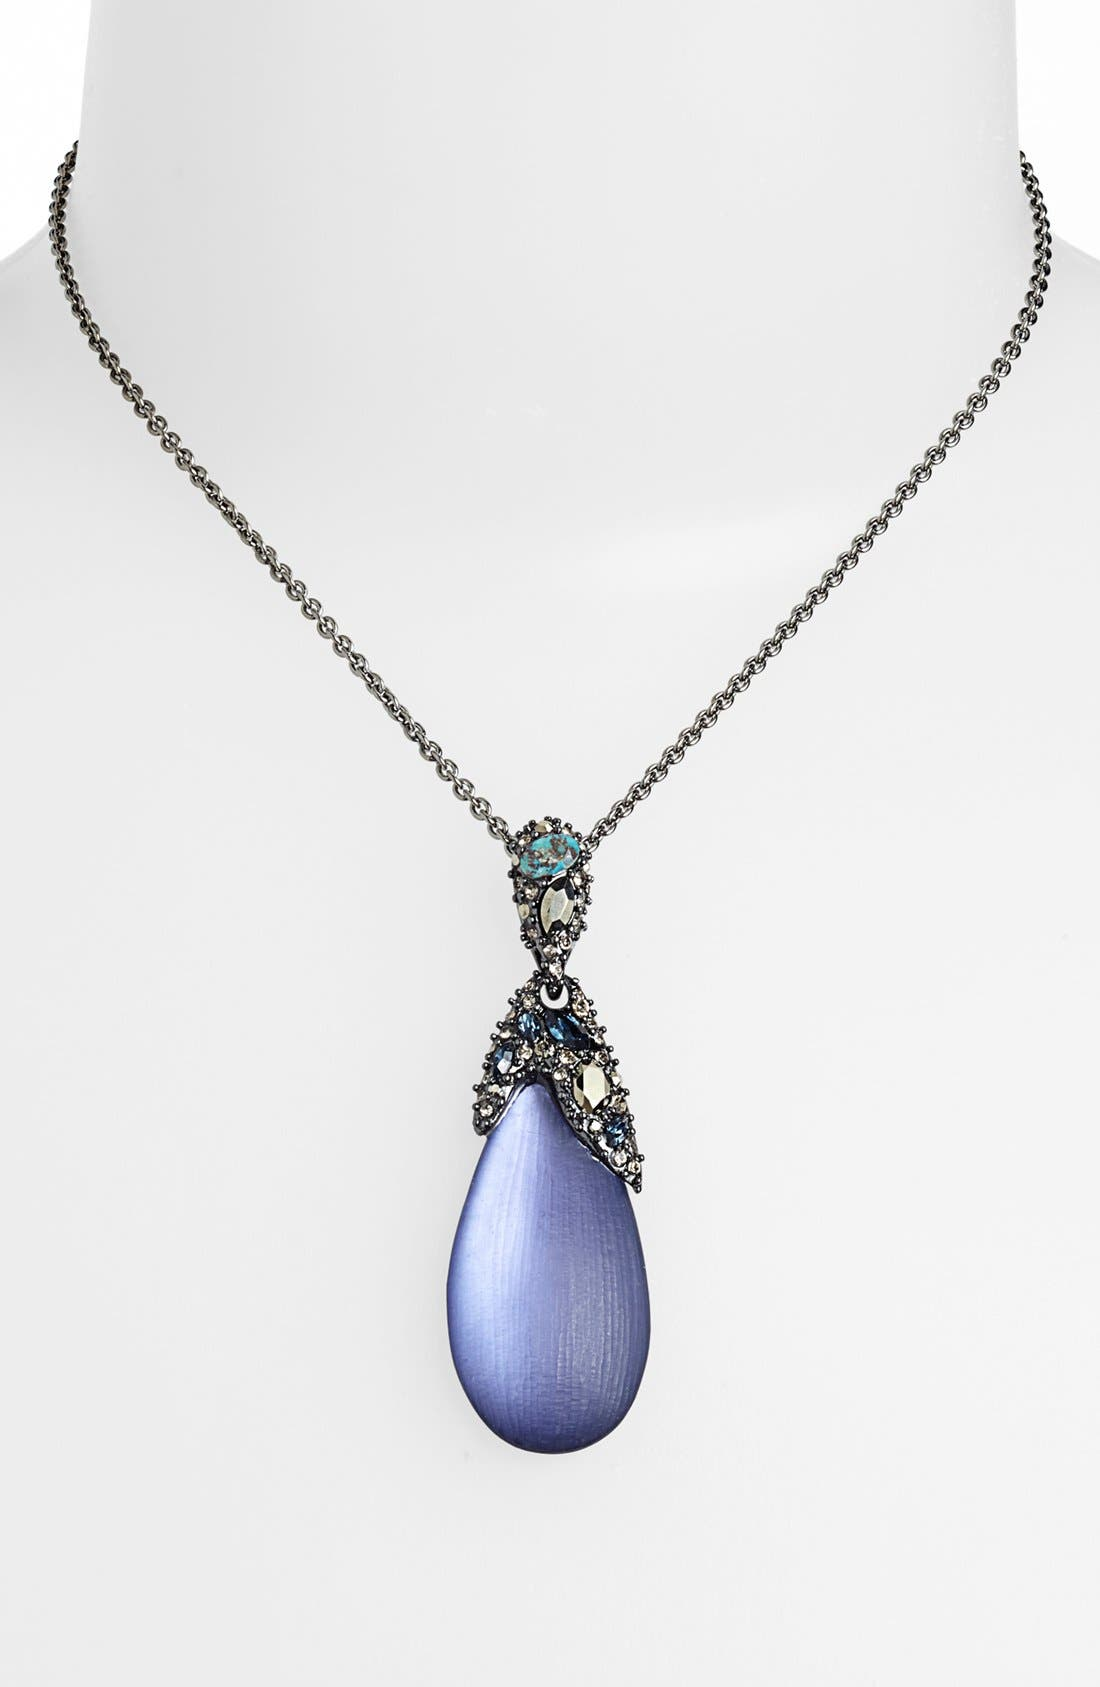 Main Image - Alexis Bittar 'Lucite® - Neo Bohemian' Teardrop Pendant Necklace